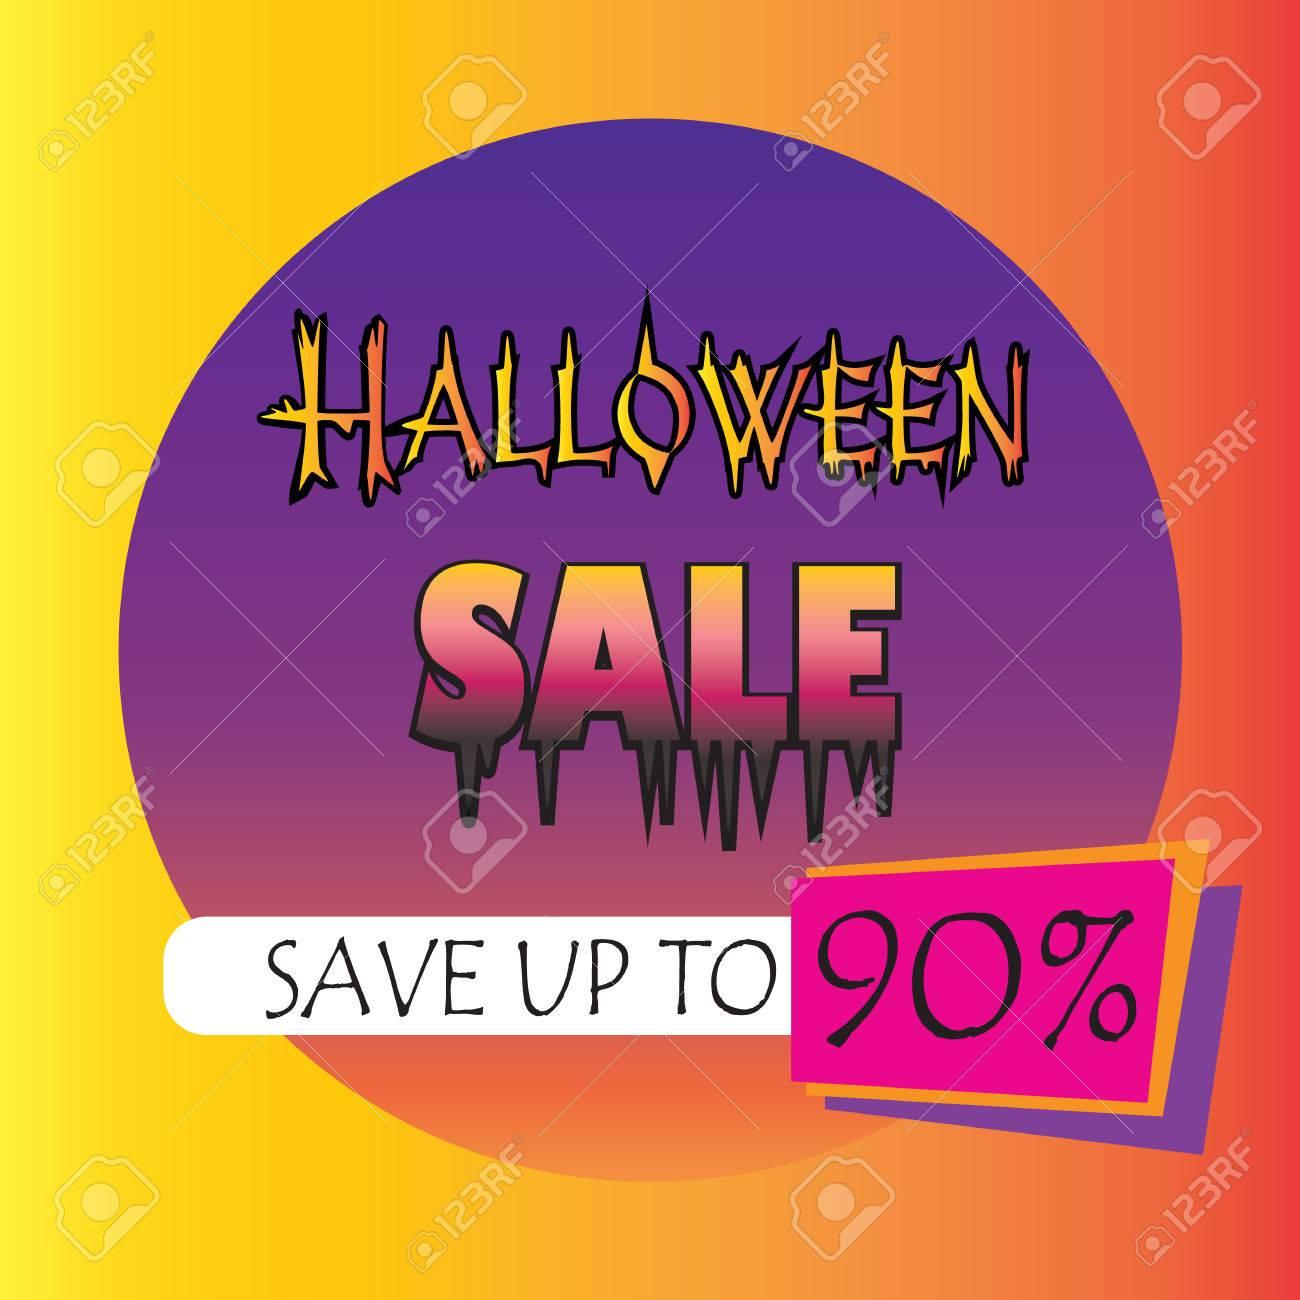 Halloween sale logo advertising halloween special offer sale halloween sale logo advertising halloween special offer sale voucher invitation gift card stopboris Choice Image